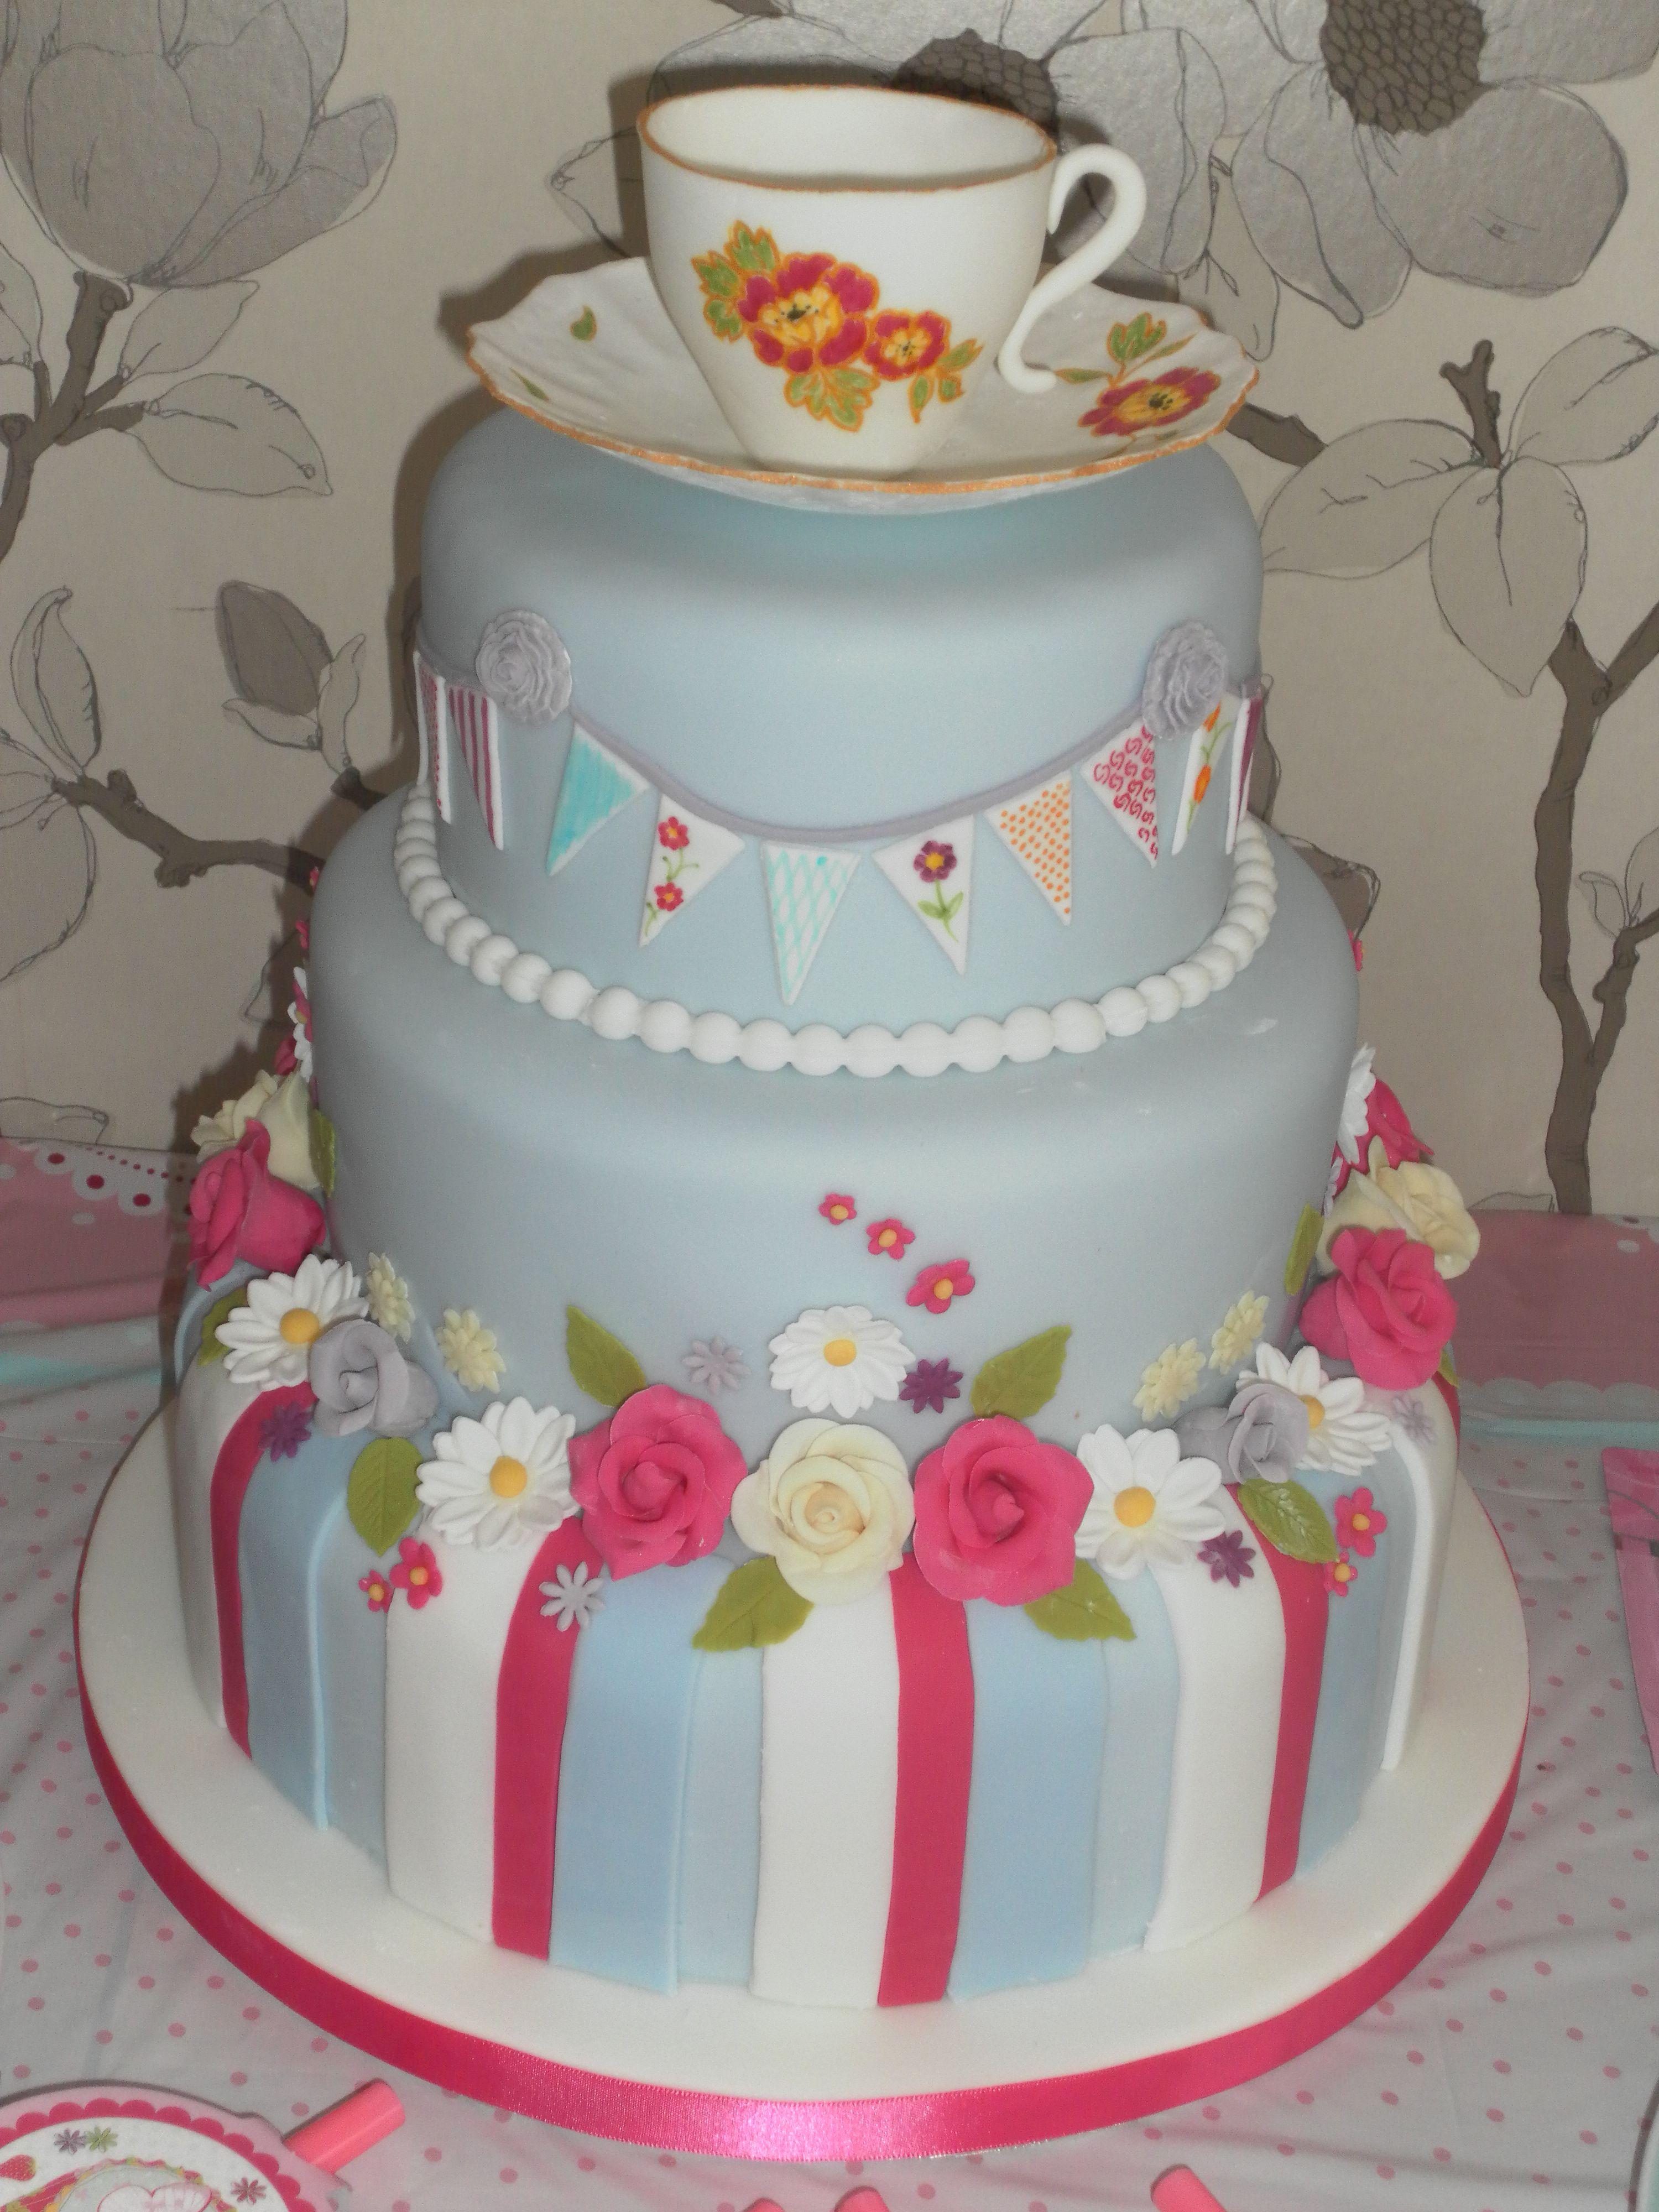 Afternoon Tea Birthday Cake | té | Pinterest | Afternoon tea ...